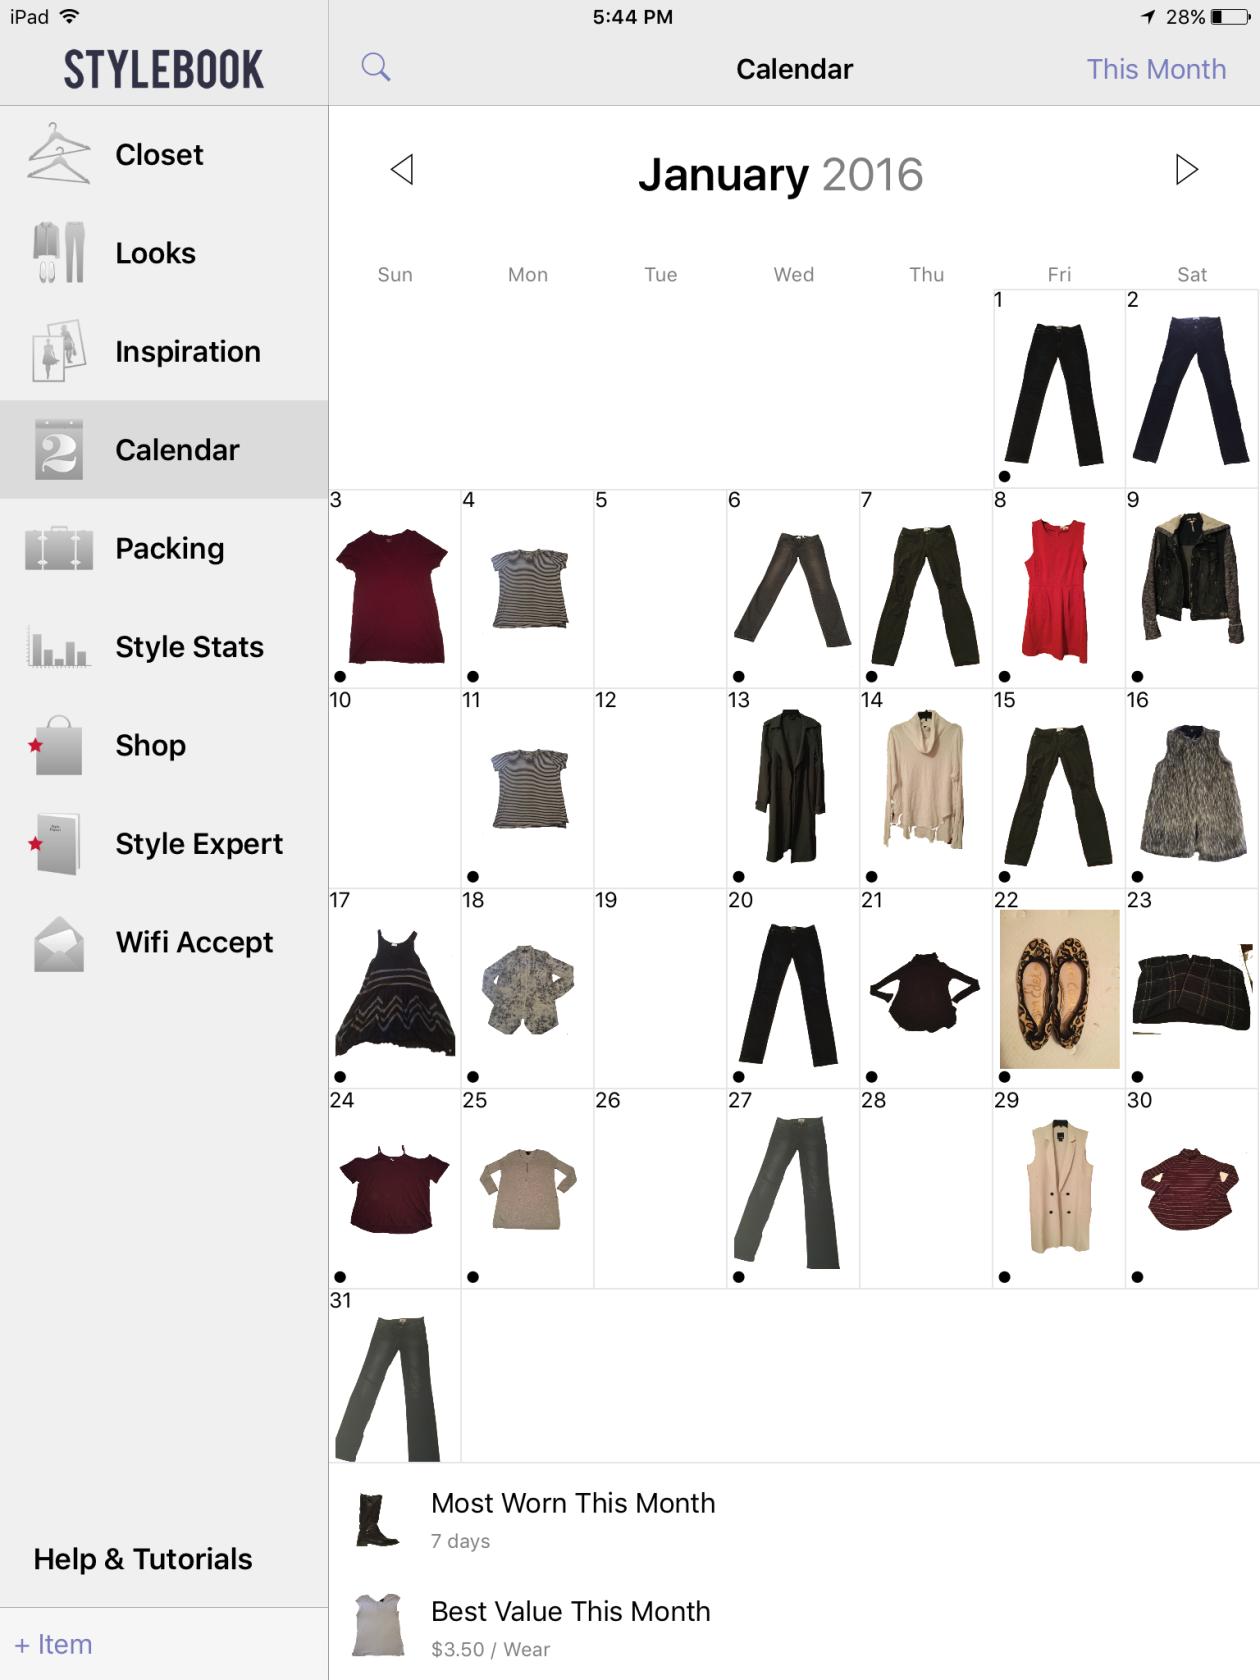 How I Use The Stylebook App Stylebook App Stylebook Fashion Books